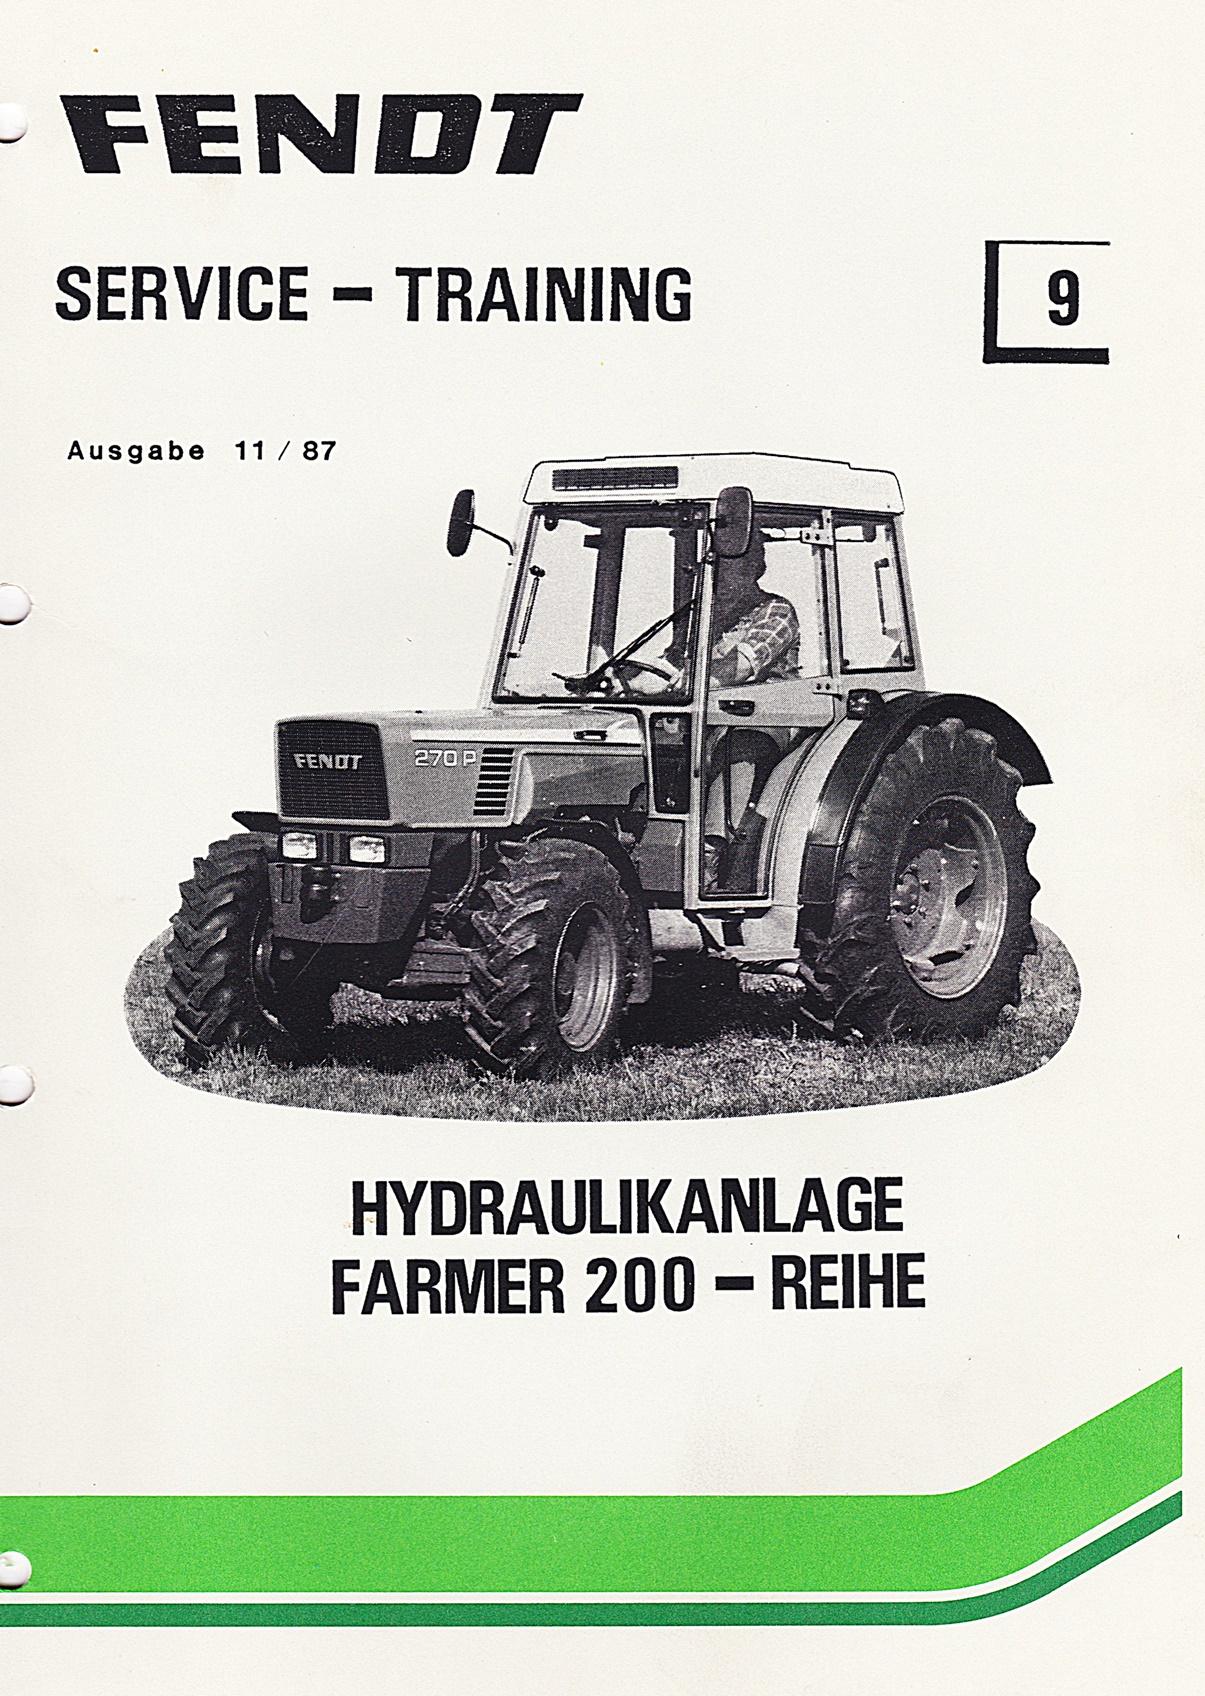 Fendt  Service und Training Nr. 9, Farmer 200 - Reihe